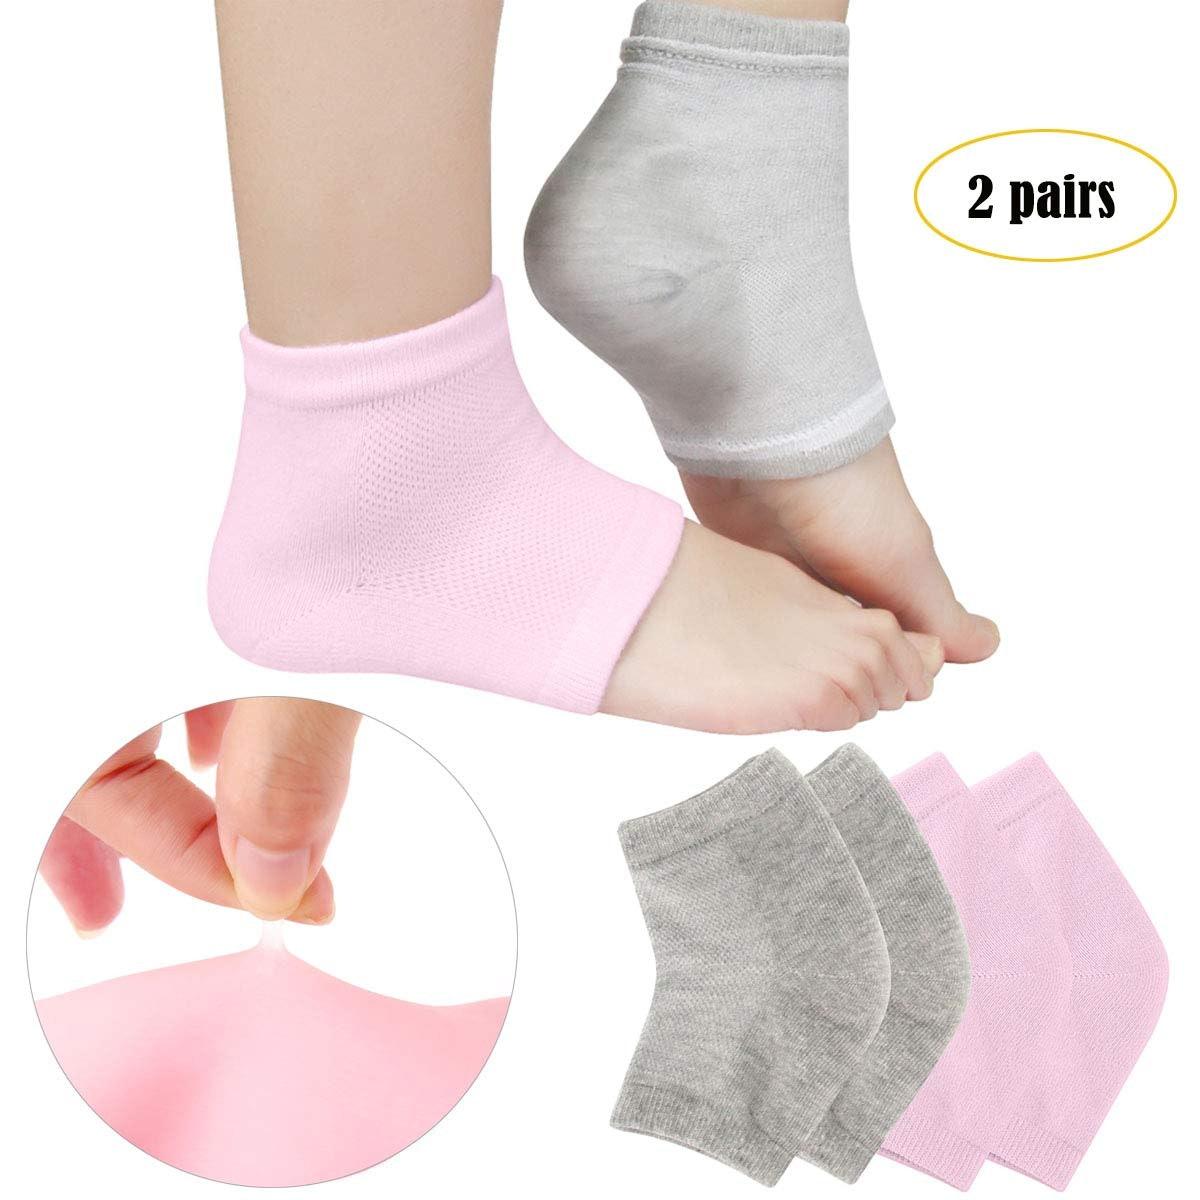 Codream Vented Lotion Moisturizing Socks